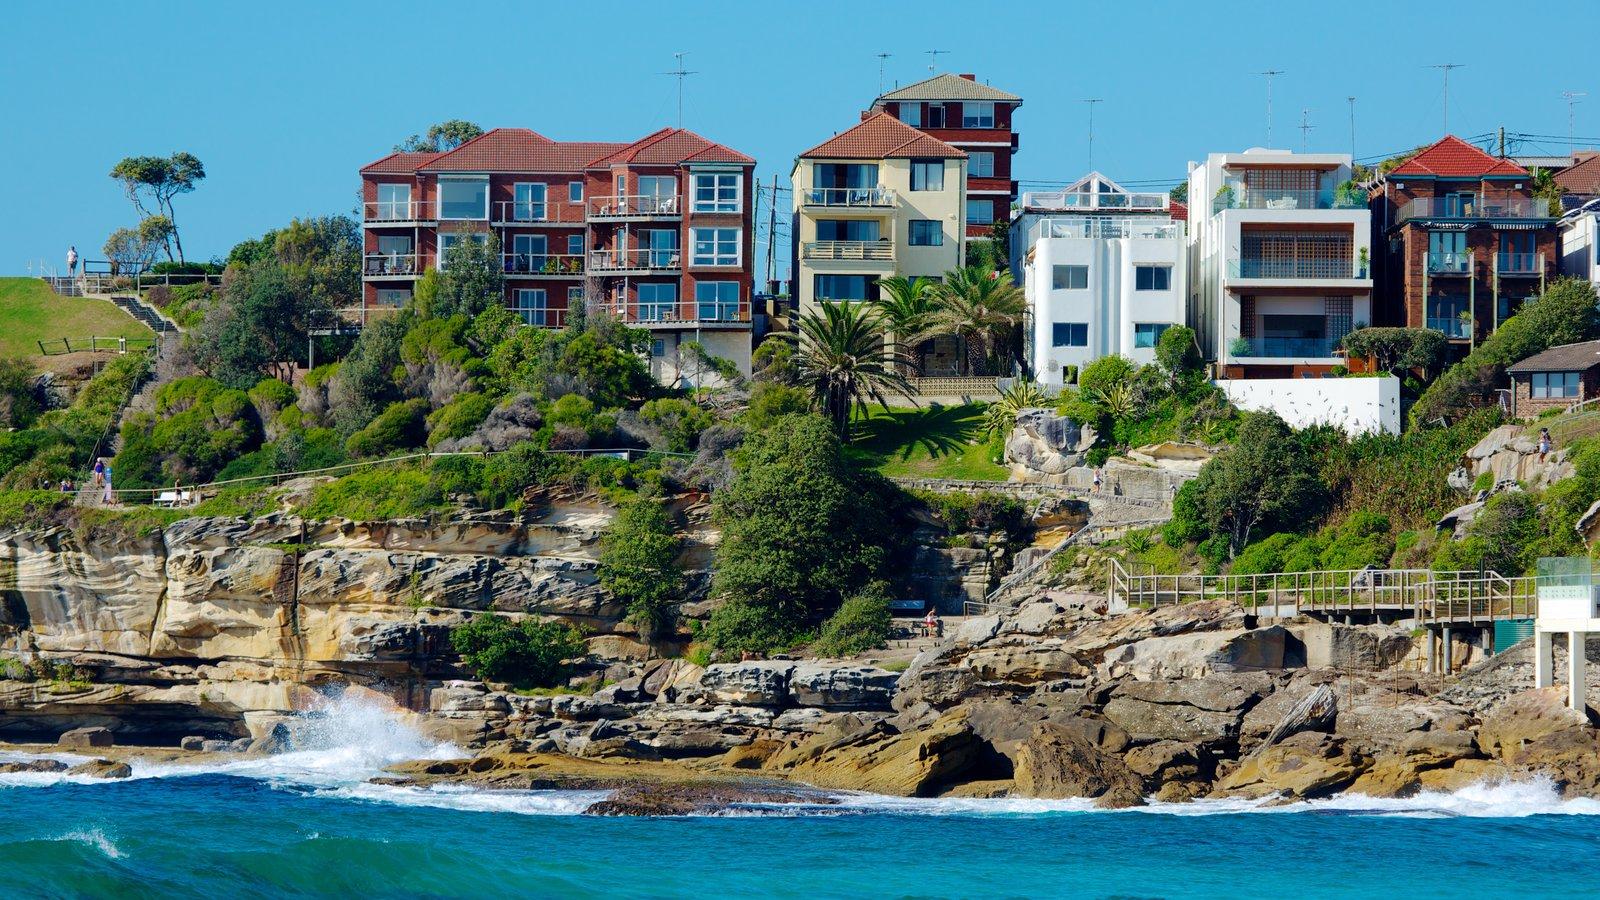 Bondi Beach showing rocky coastline, a house and a coastal town